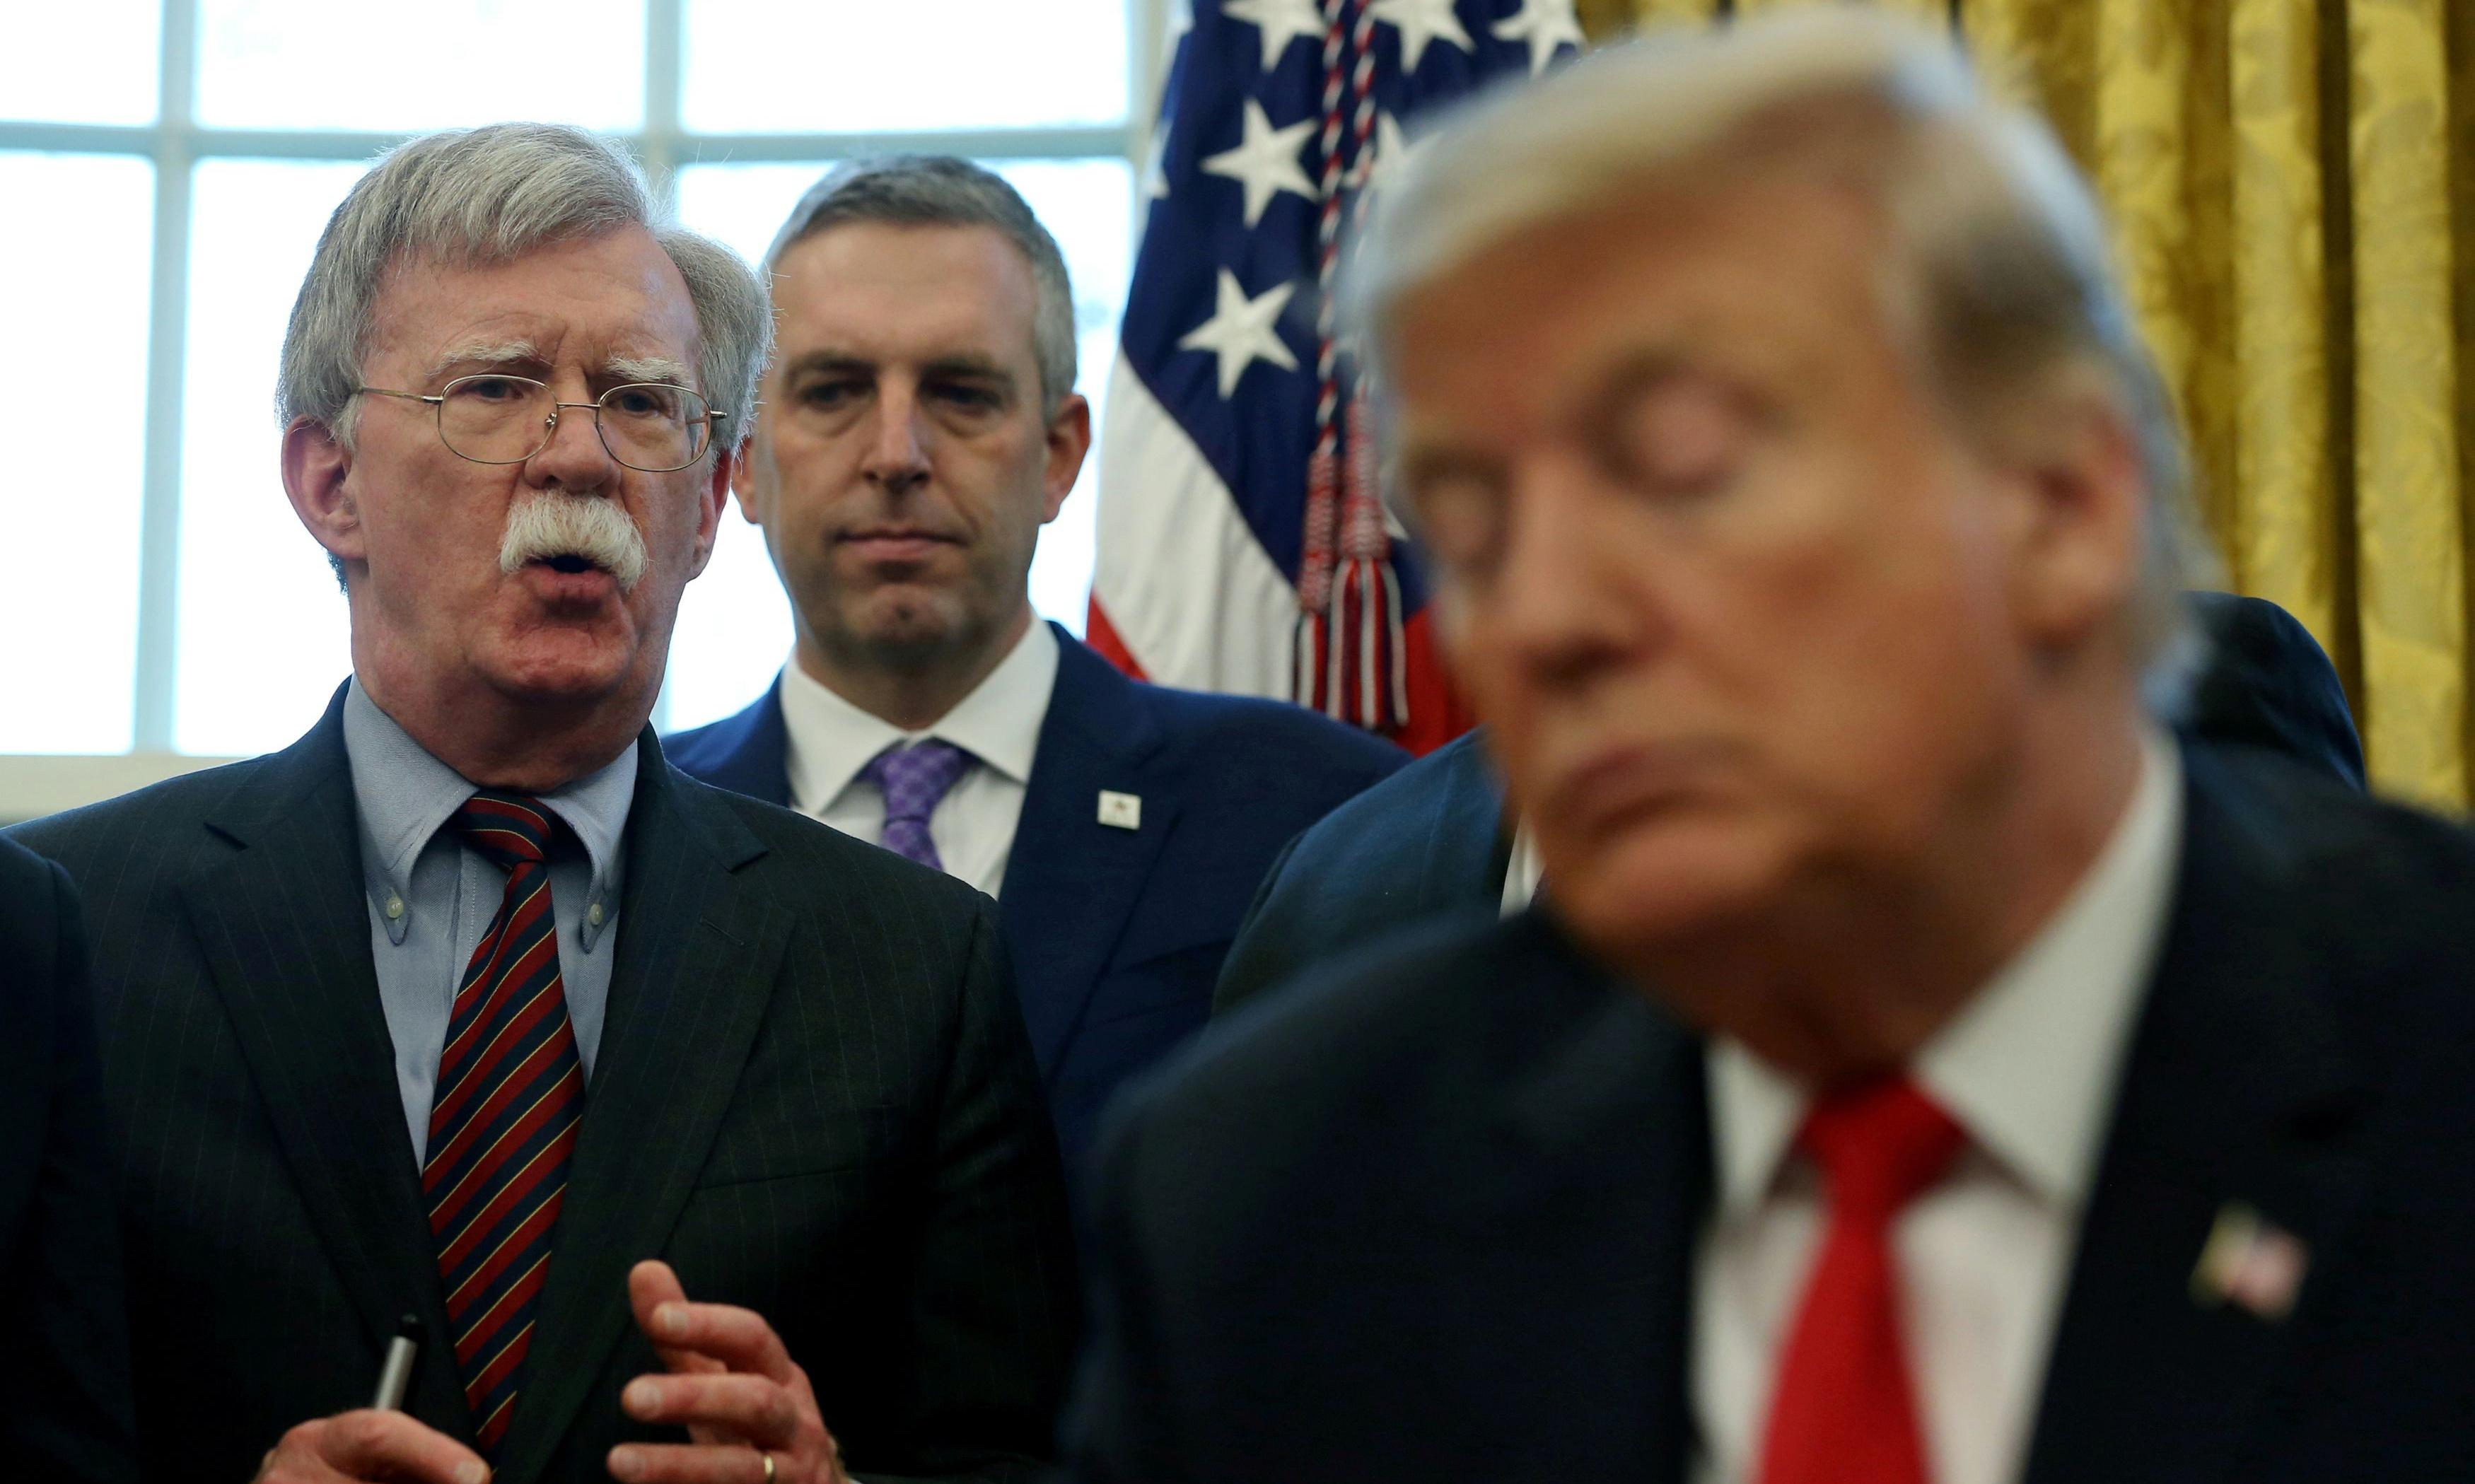 Trump linked Ukraine aid to Biden inquiry, Bolton book draft says – report